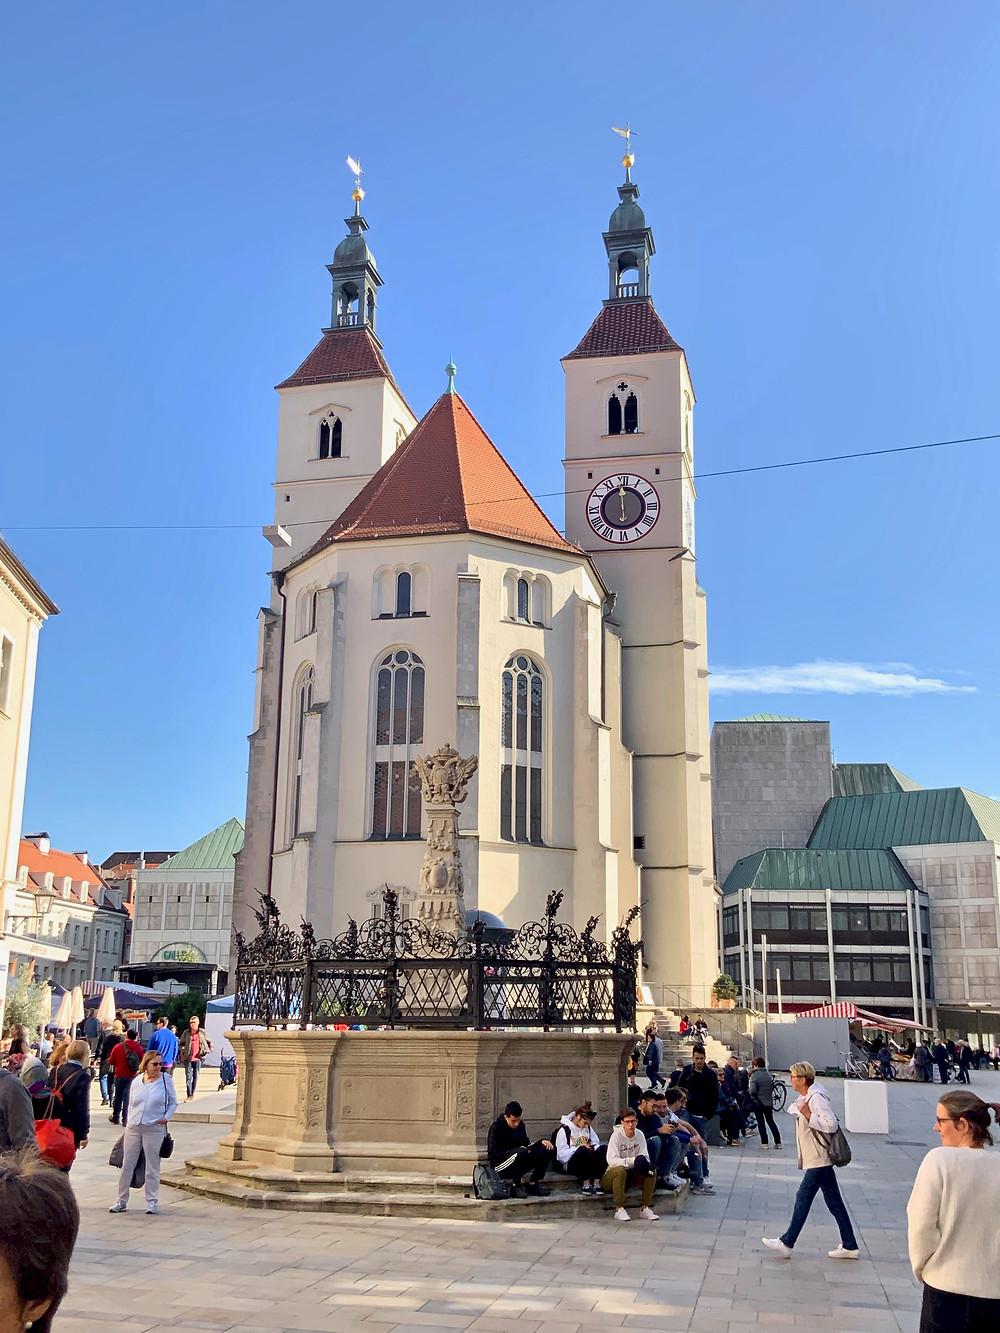 the Neupfarrkirche chapel